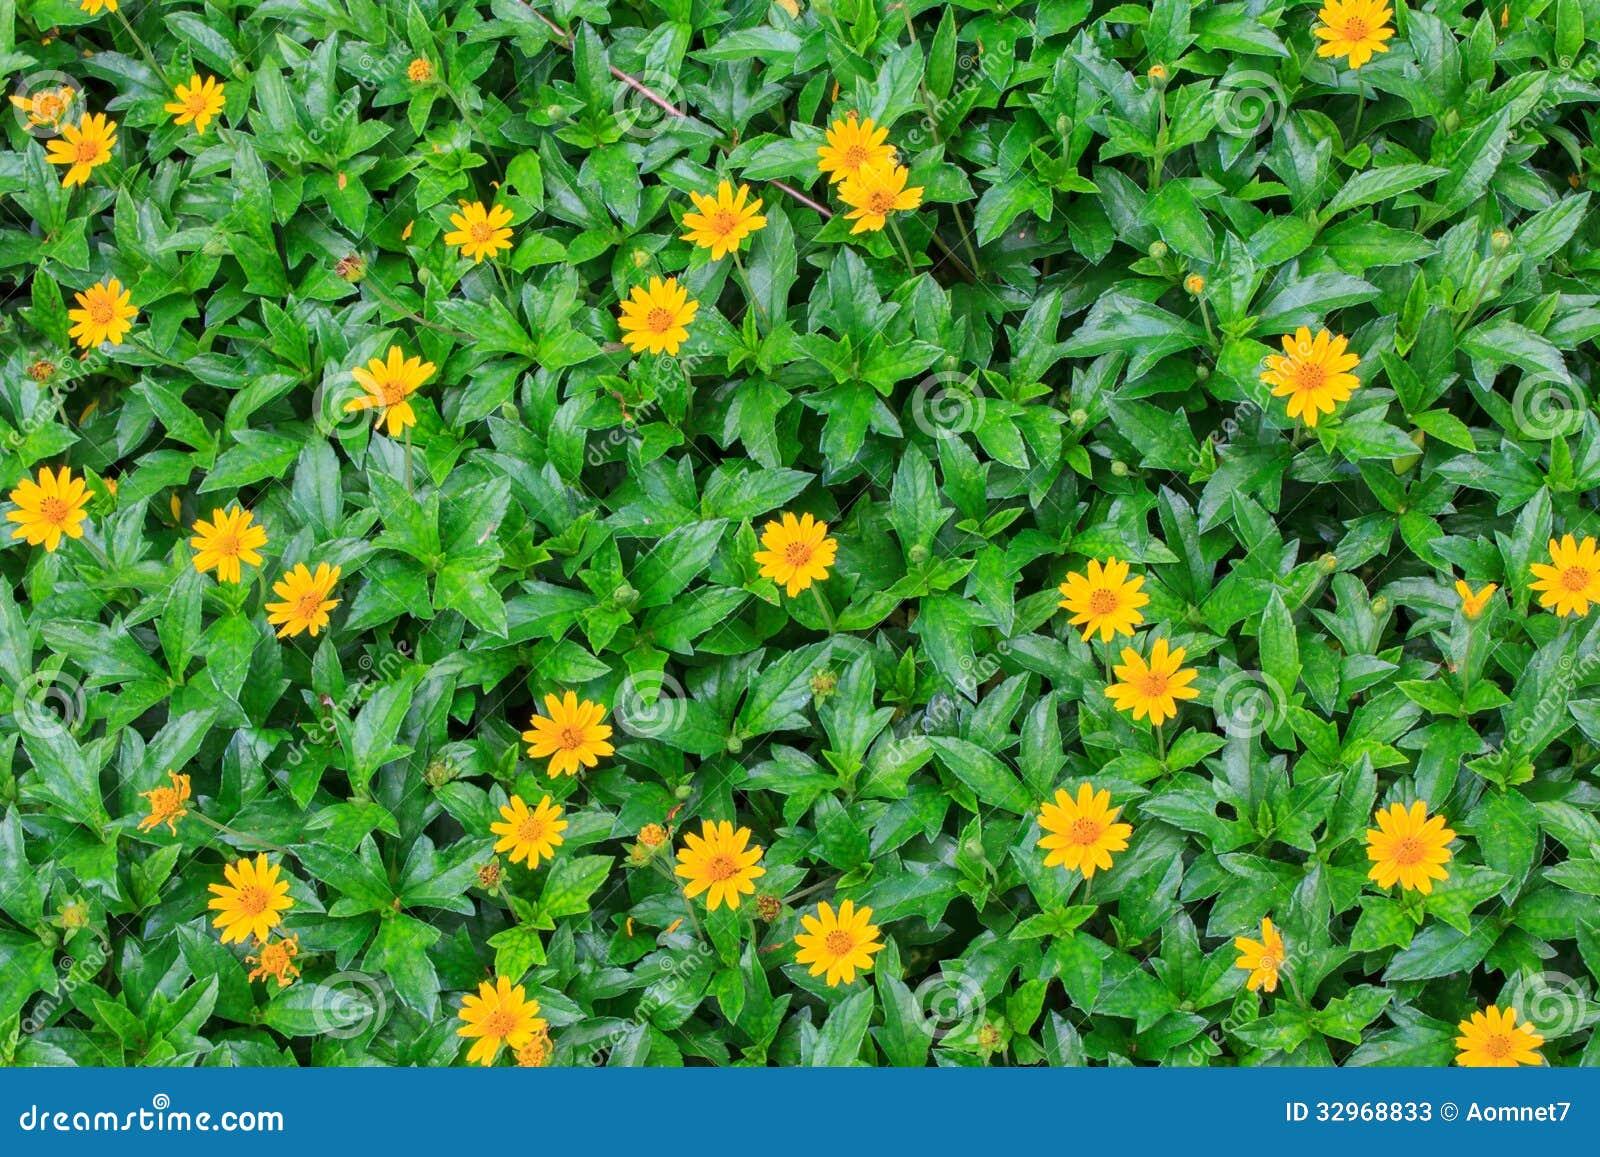 Wedelia or Sphagneticola Trilobata flowers background.